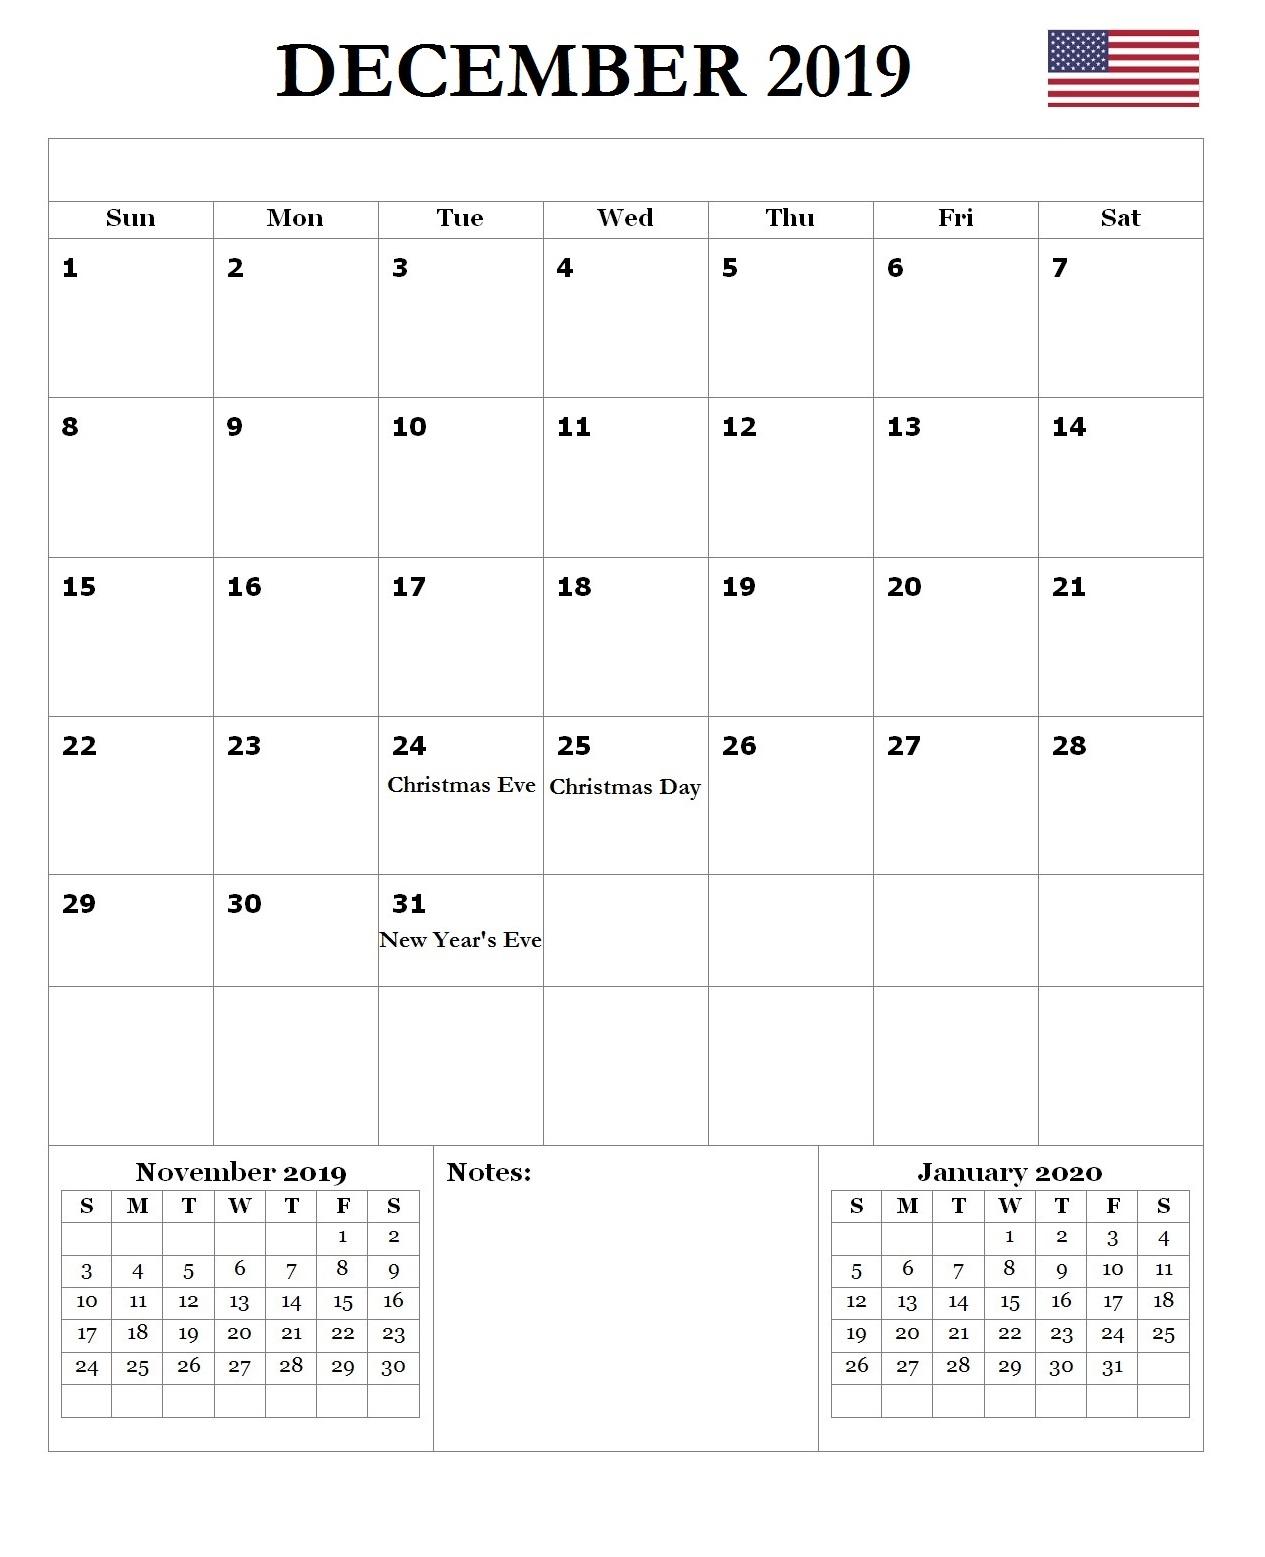 2019 December USA Federal Holidays Calendar